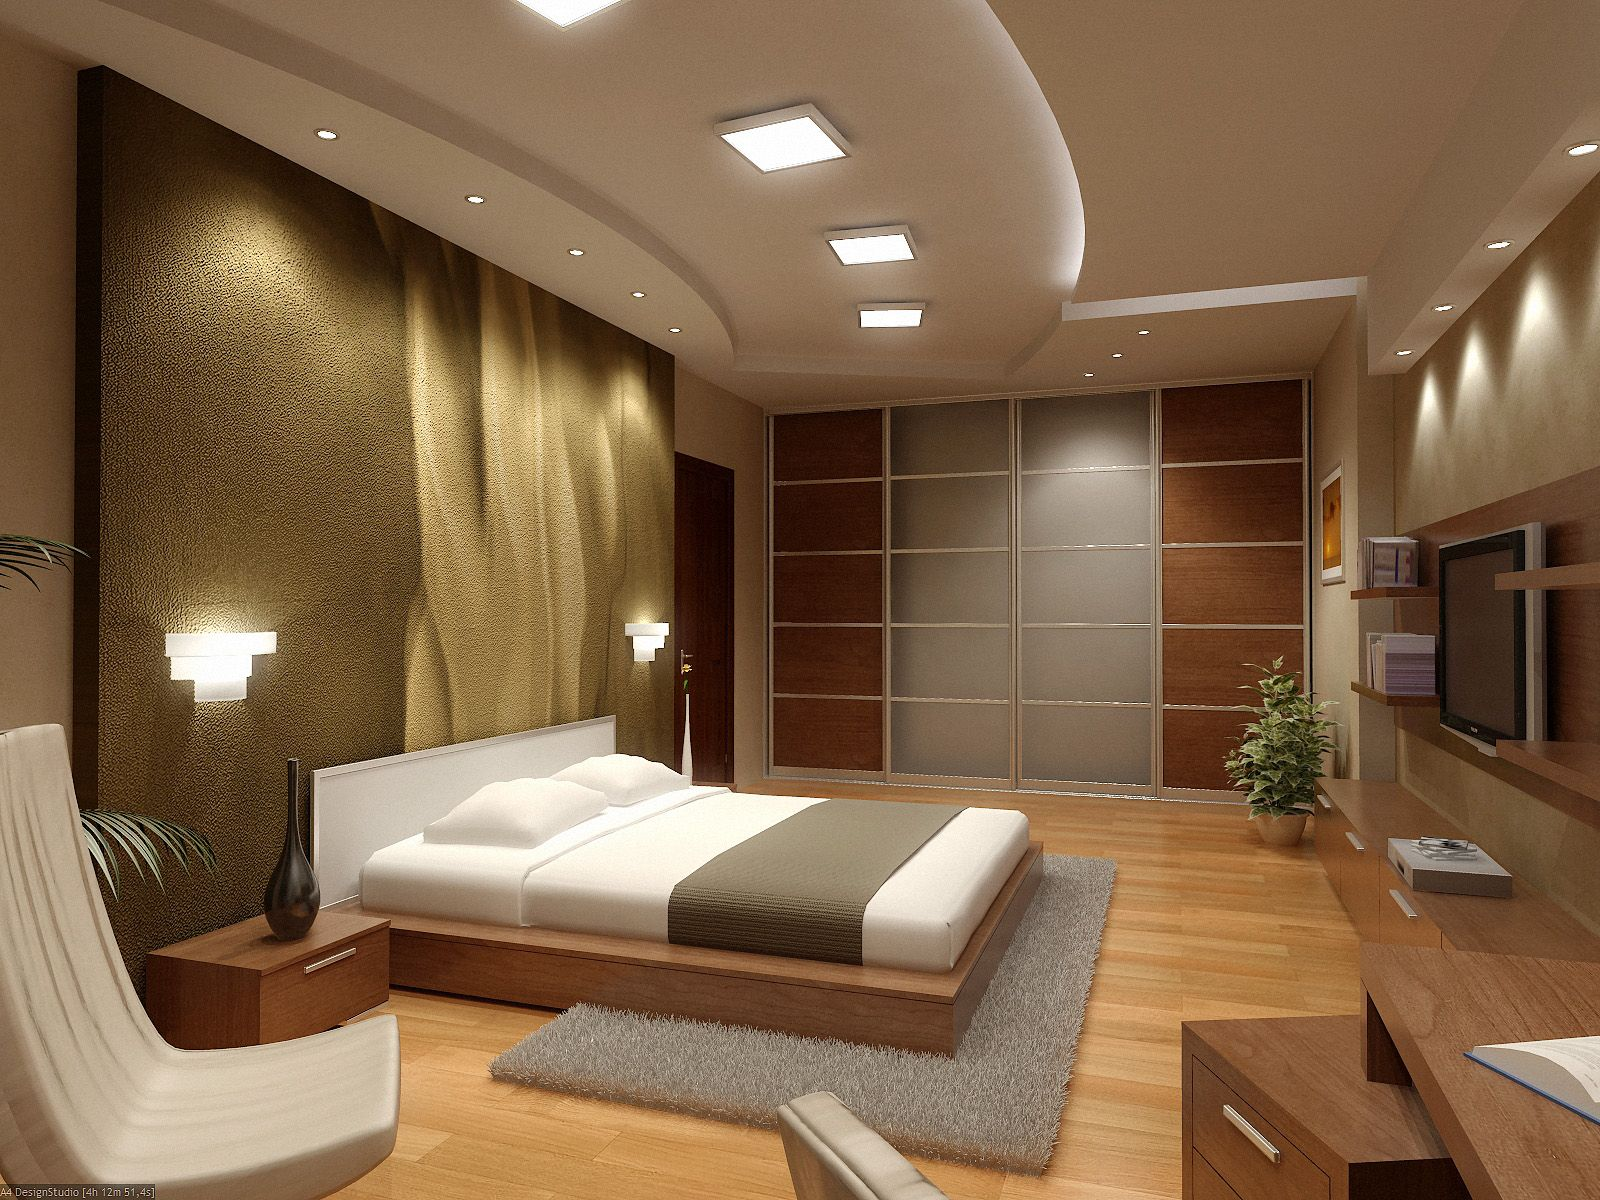 Luxury Best Interior House Designs With Modernelegantinterior In Tropical House Atmosphere With Interior Photo Interior House Designs